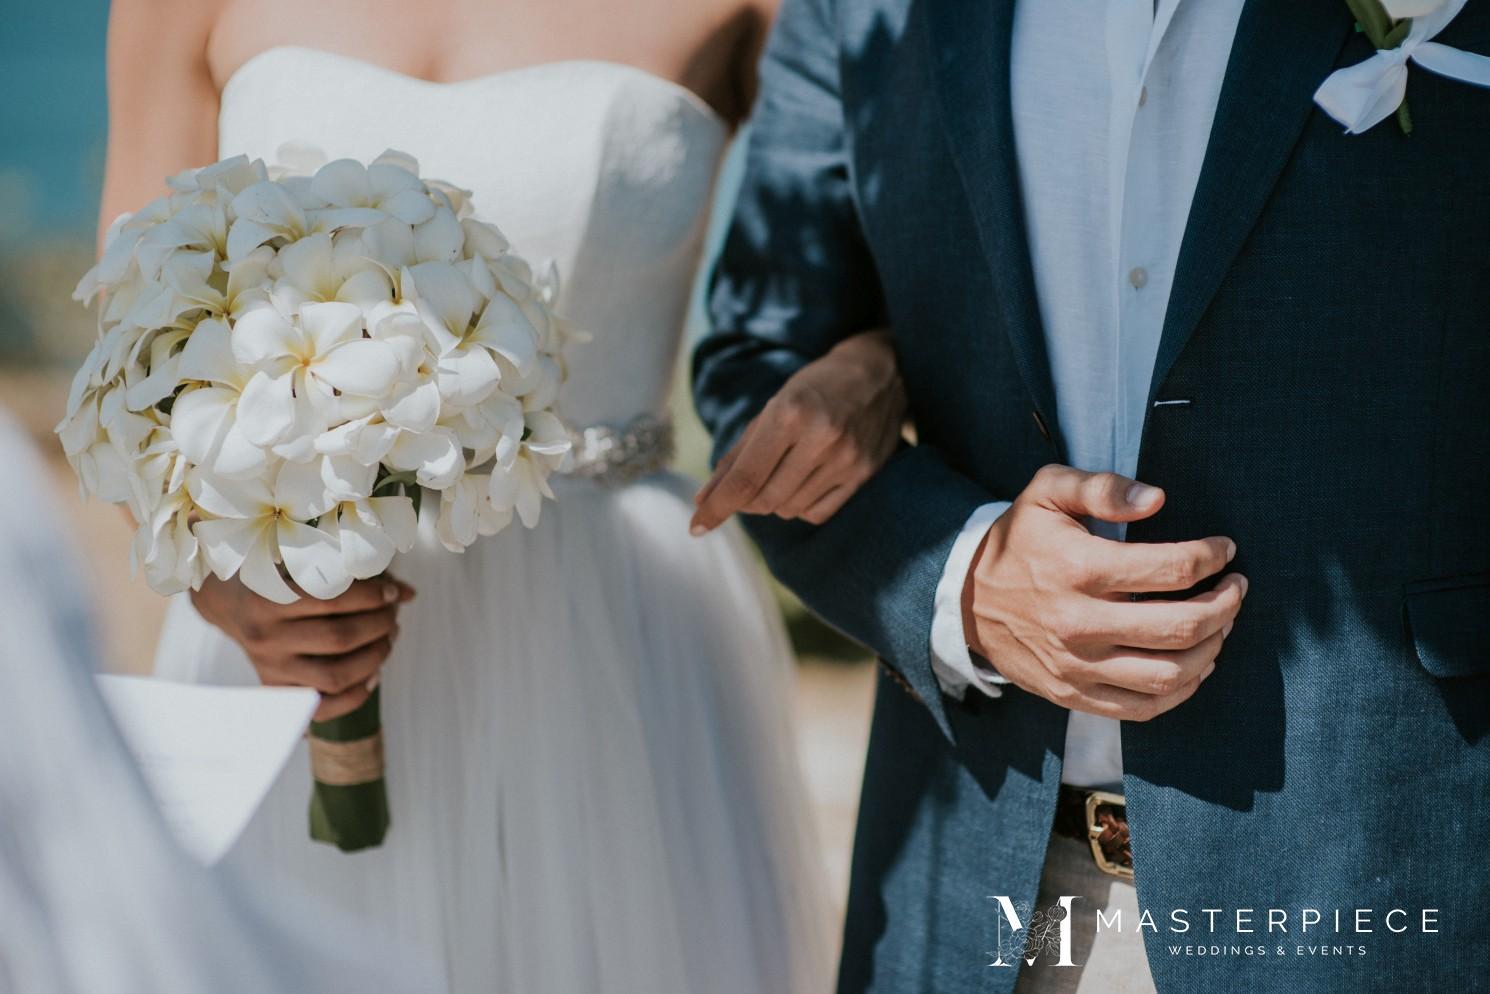 Masterpiece_Weddings_sluby_022